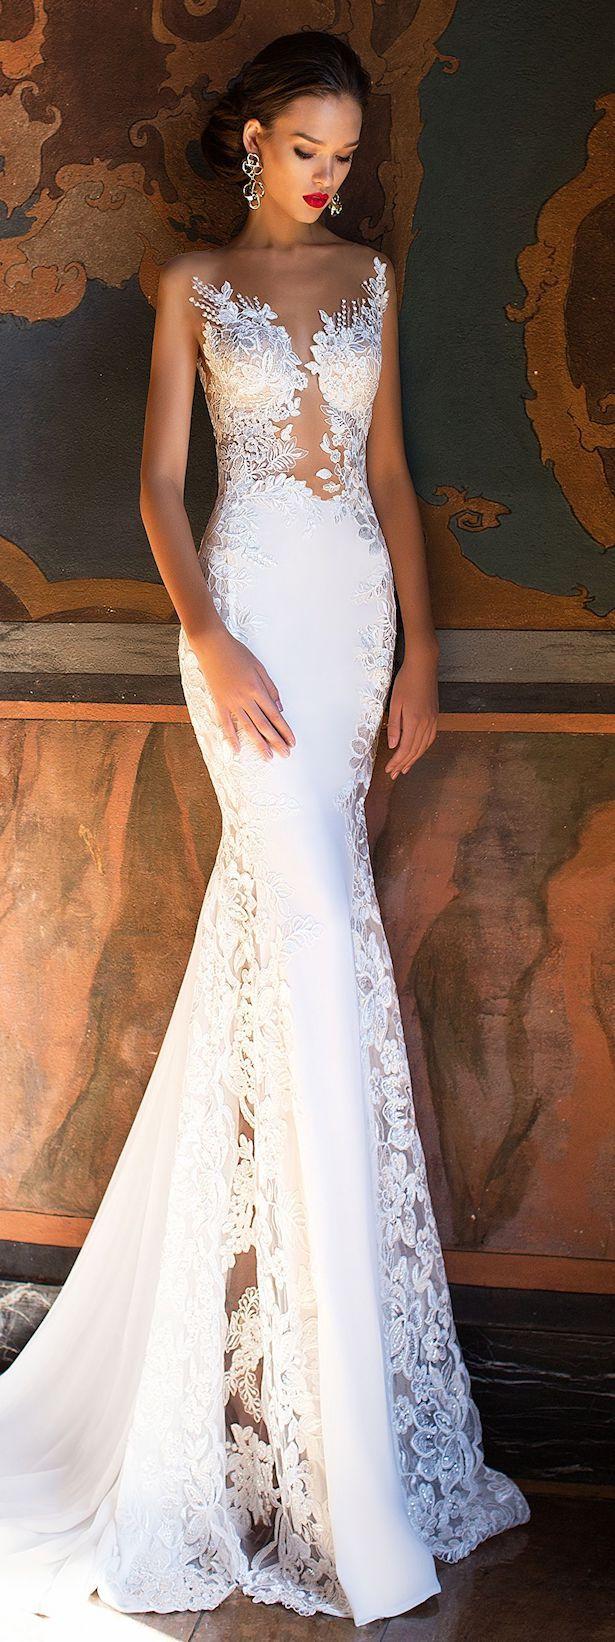 Wedding Dress by Milla Nova White Desire 2017 Bridal Collection - Lorena